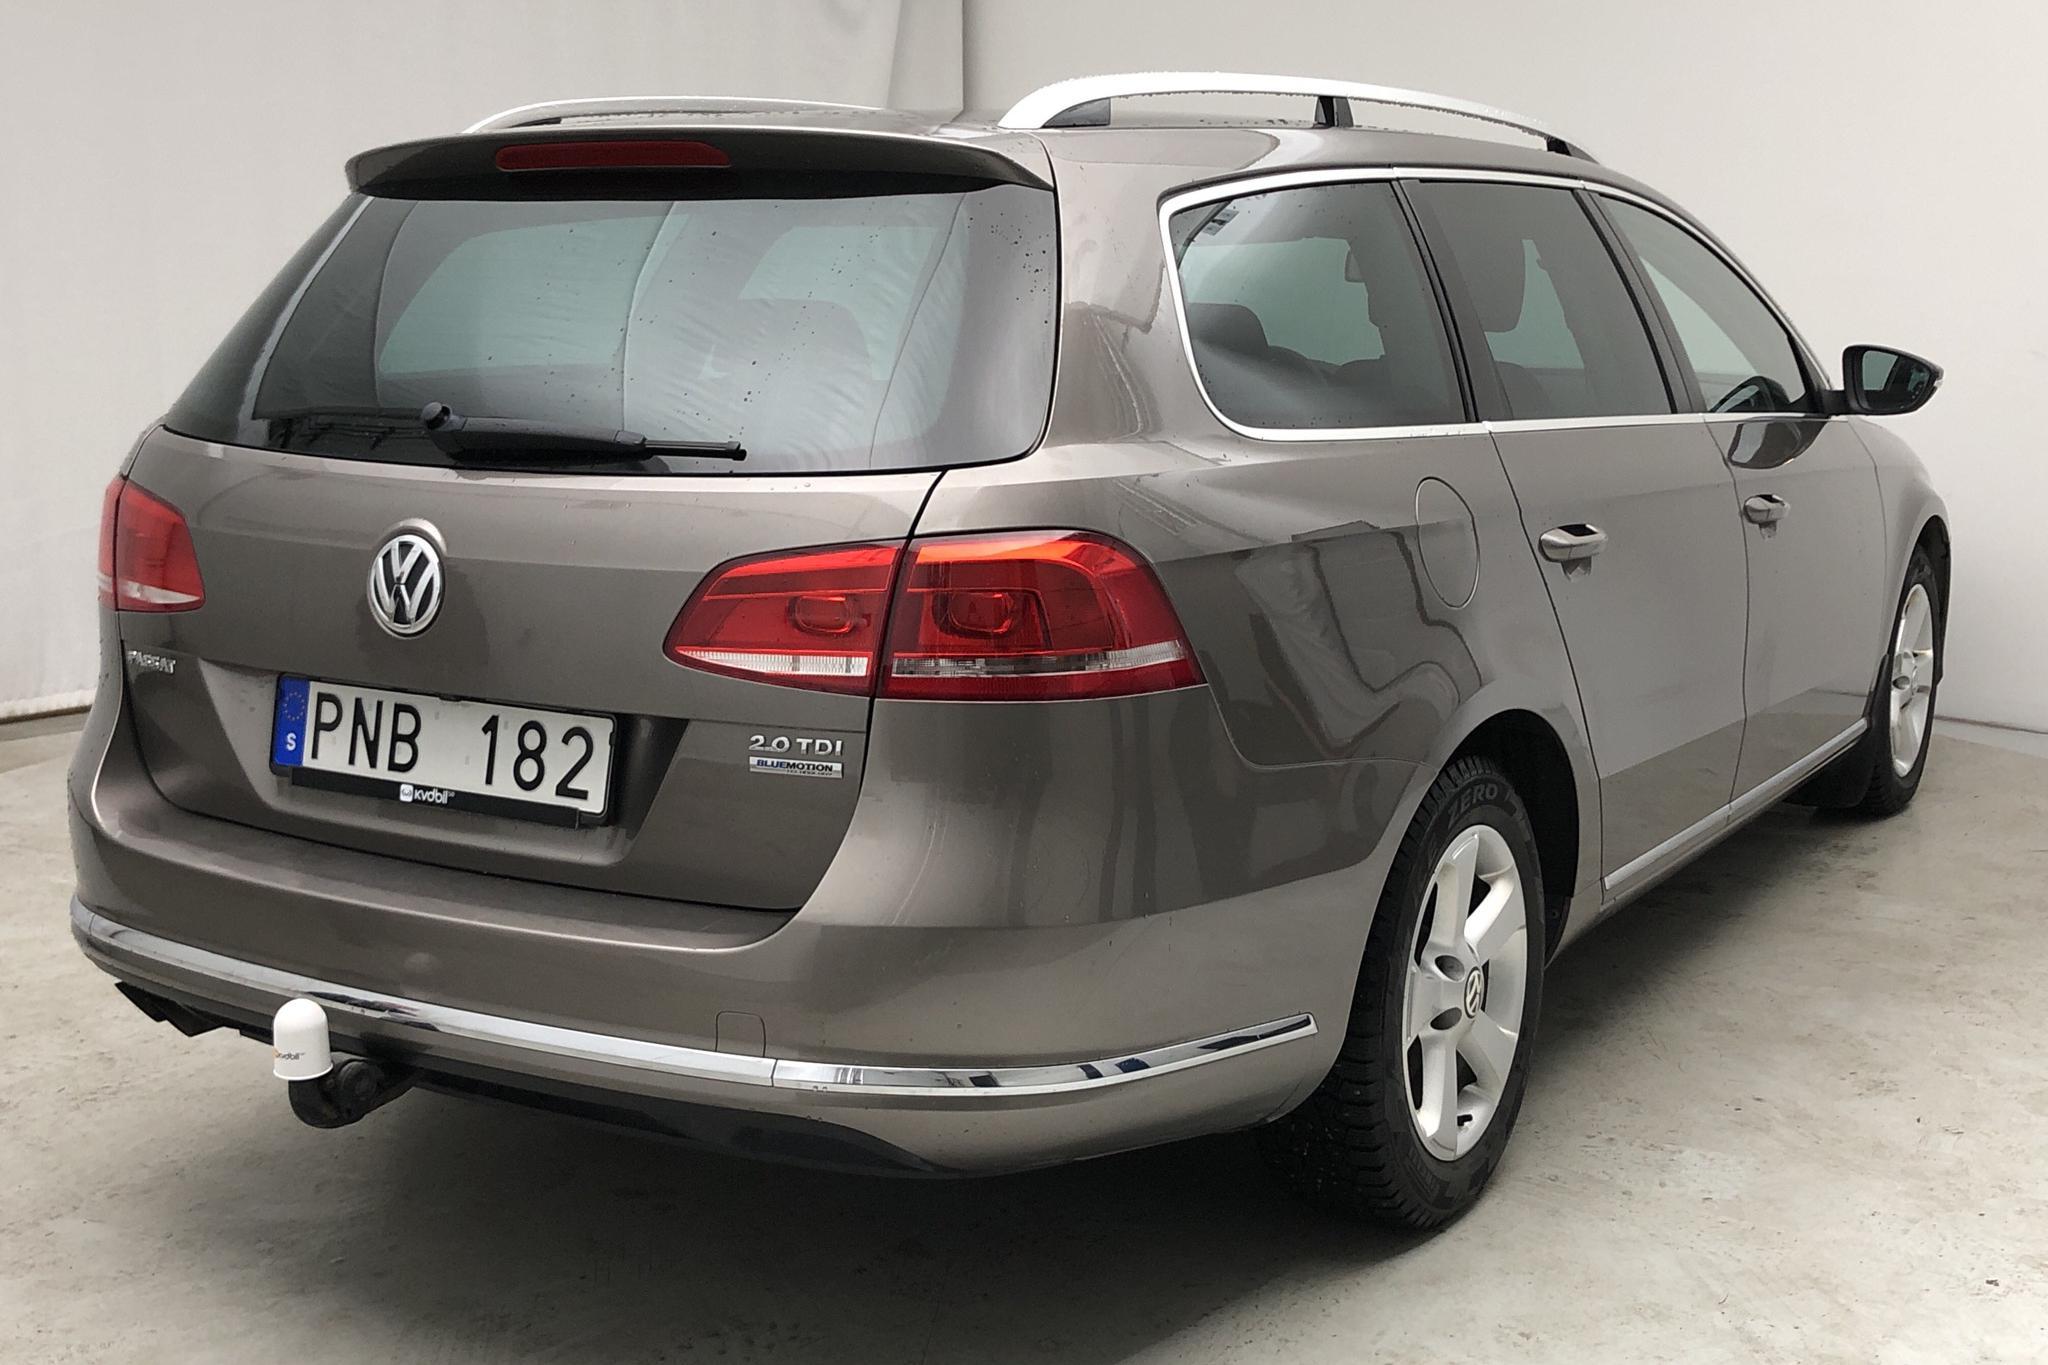 VW Passat 2.0 TDI BlueMotion Technology Variant (140hk) - 118 620 km - Manual - Light Brown - 2012